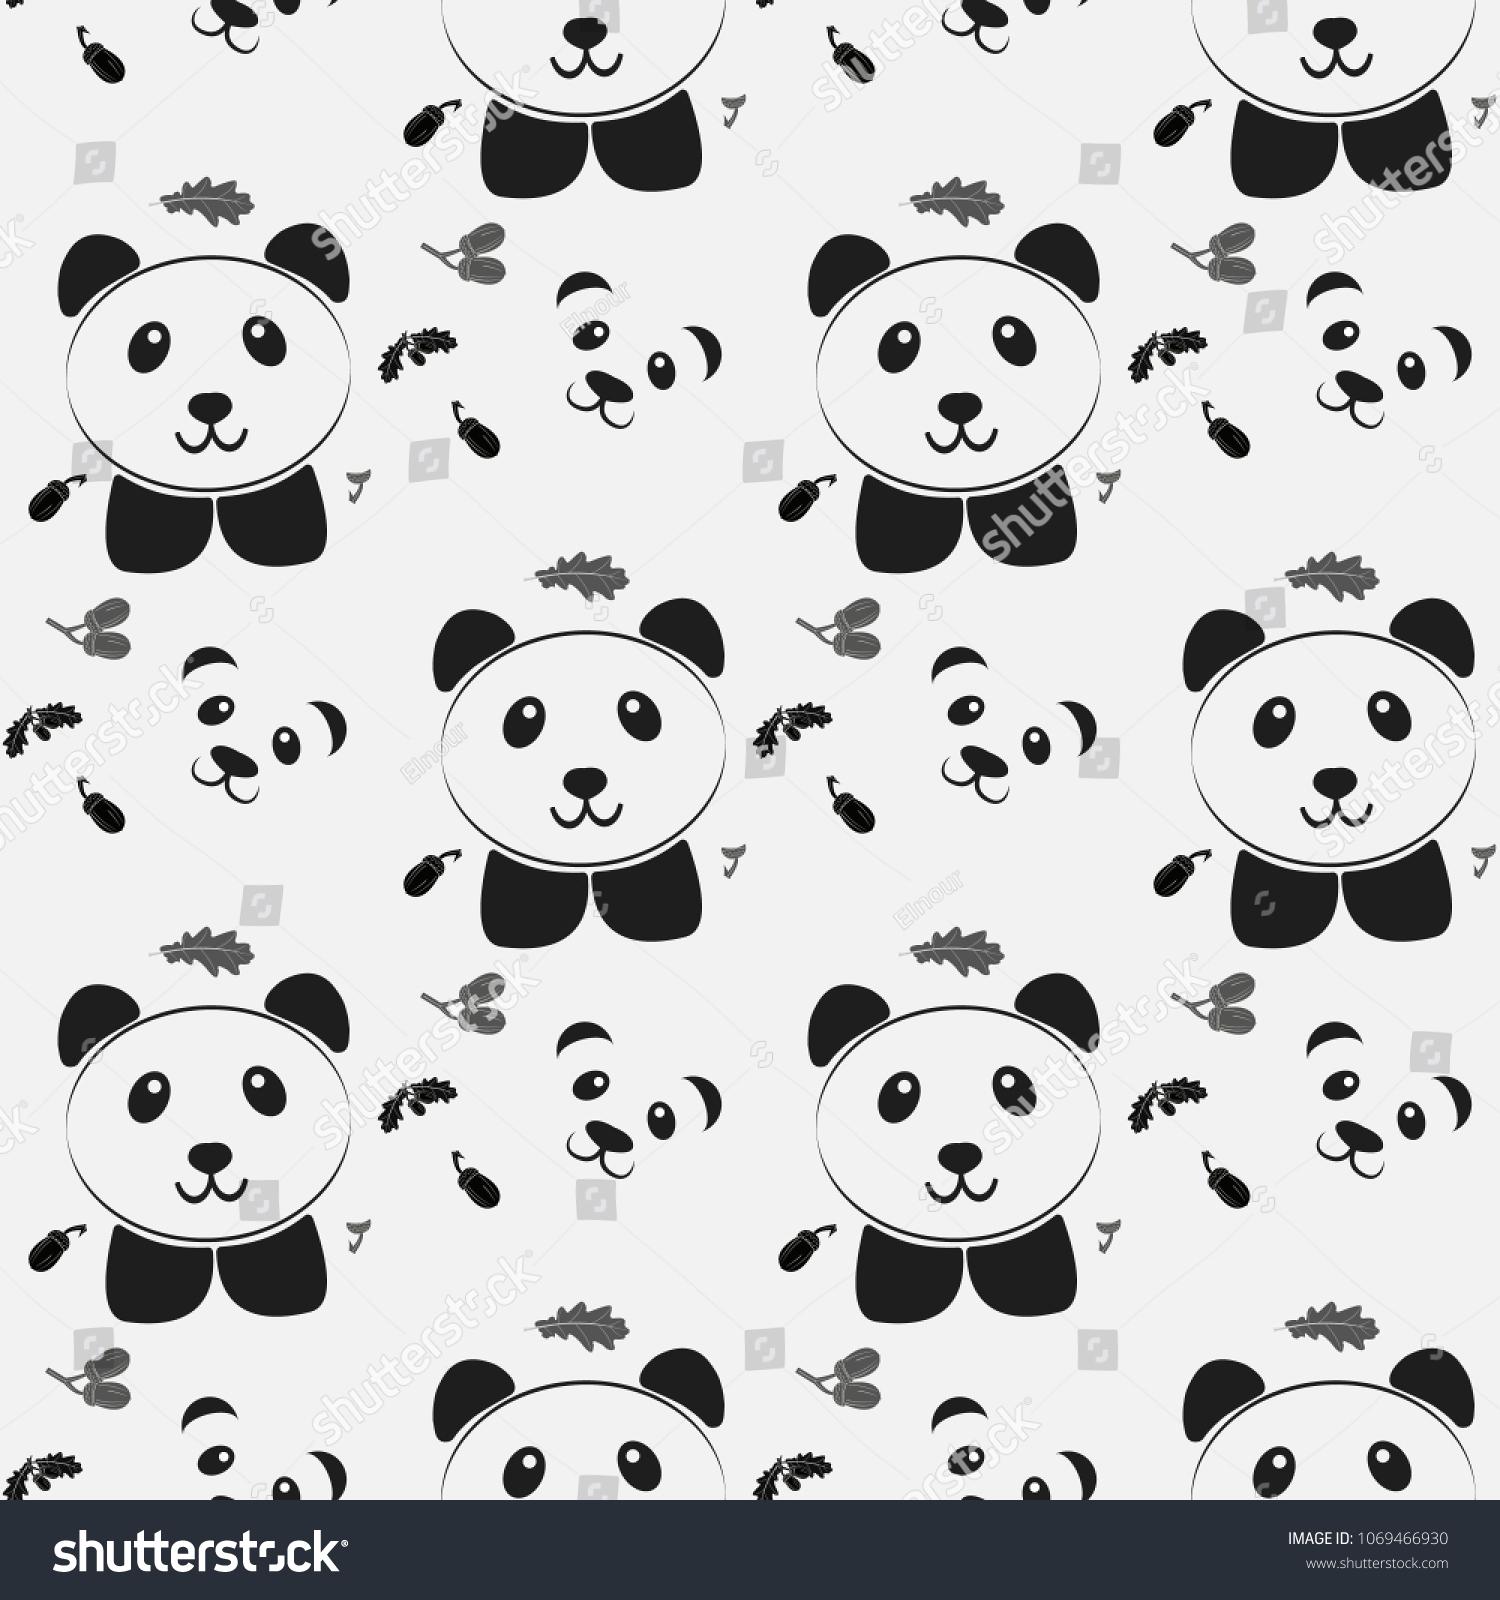 Cute Panda Face Seamless Wallpaper Seamless Stock Vector Royalty